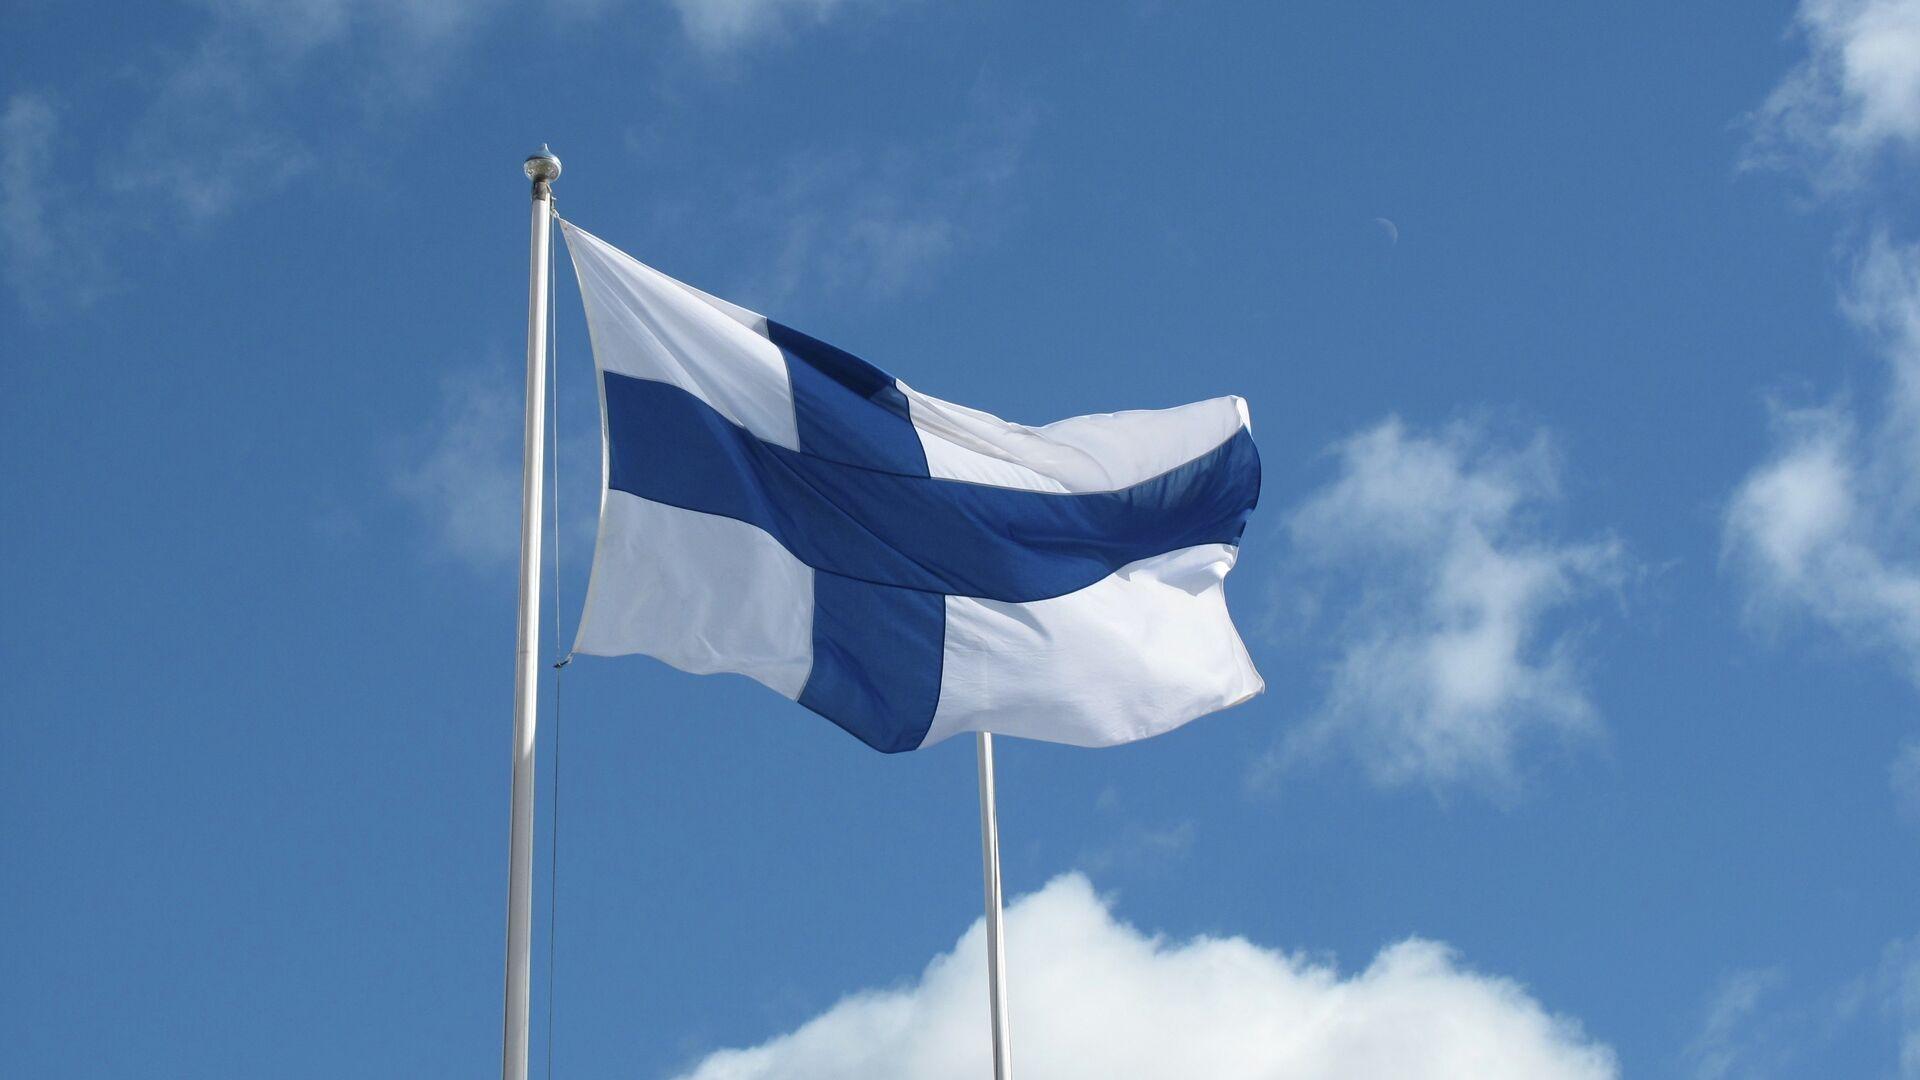 Bandera de Finlandia - Sputnik Mundo, 1920, 02.07.2021